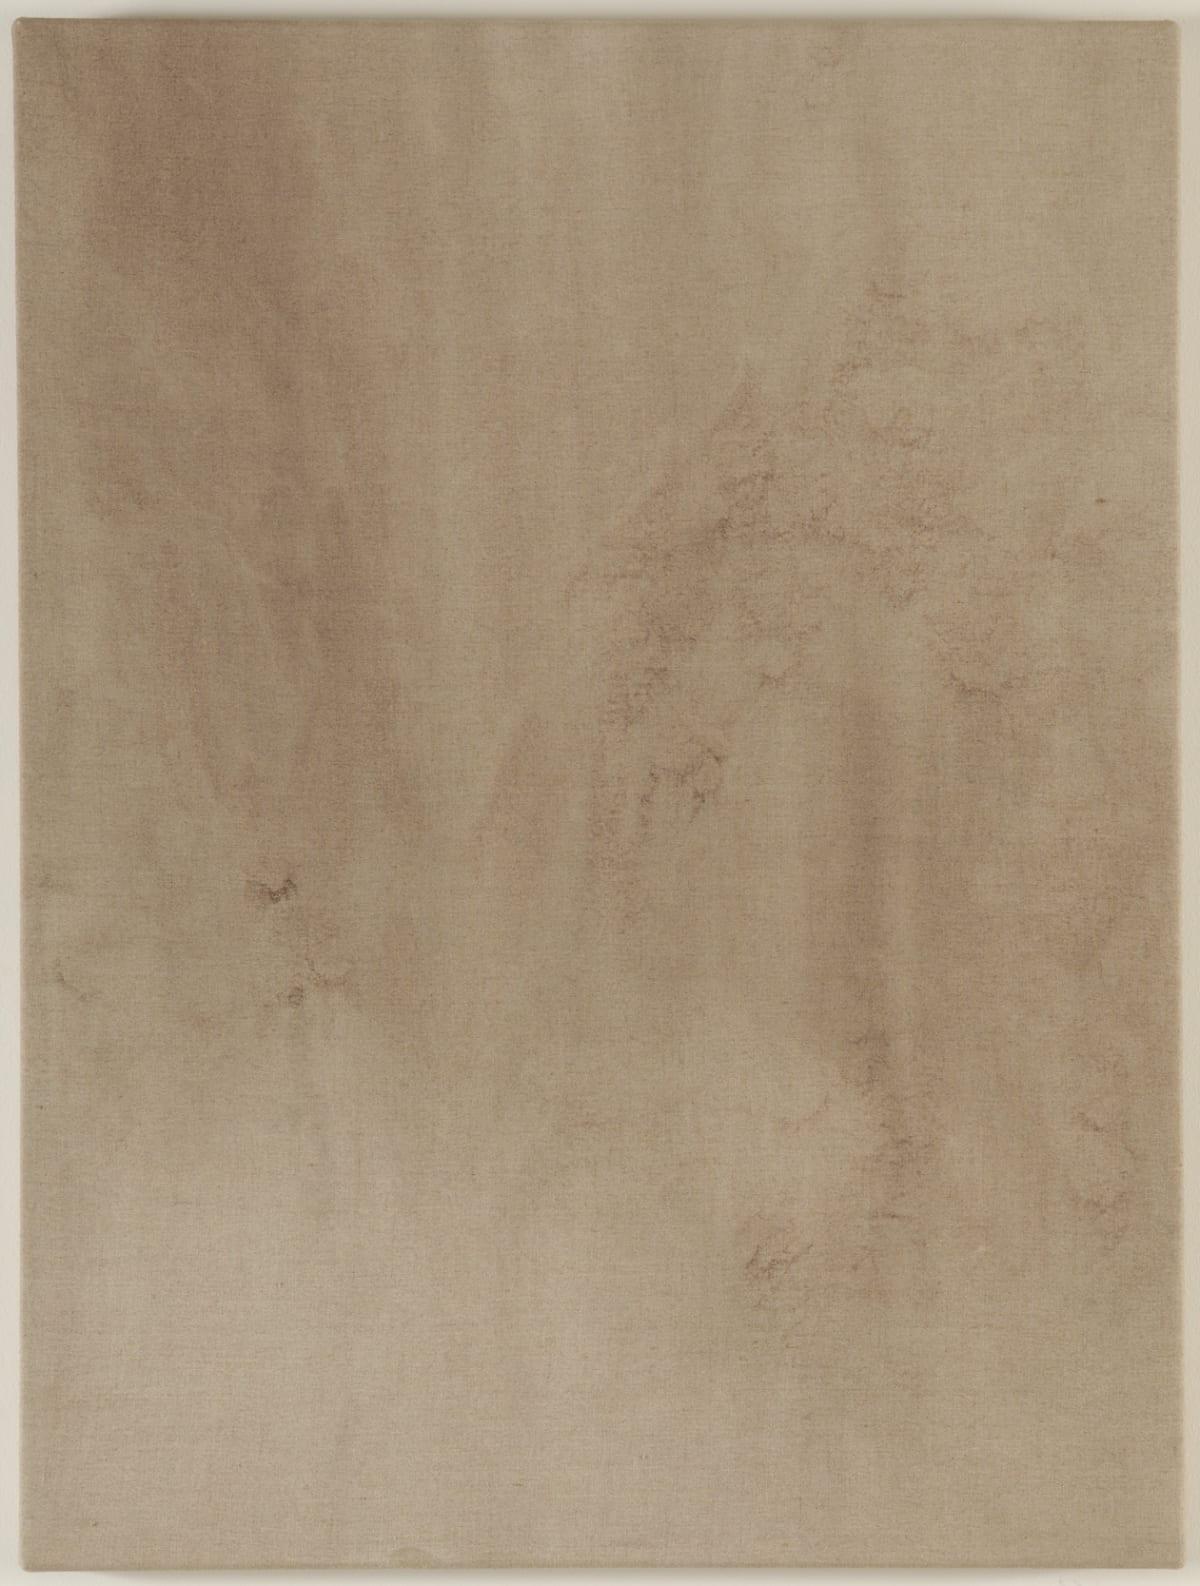 Michael Biberstein Small Atractor, 2010 Acrilíco s/ linho 81 x 61 x 5 cm